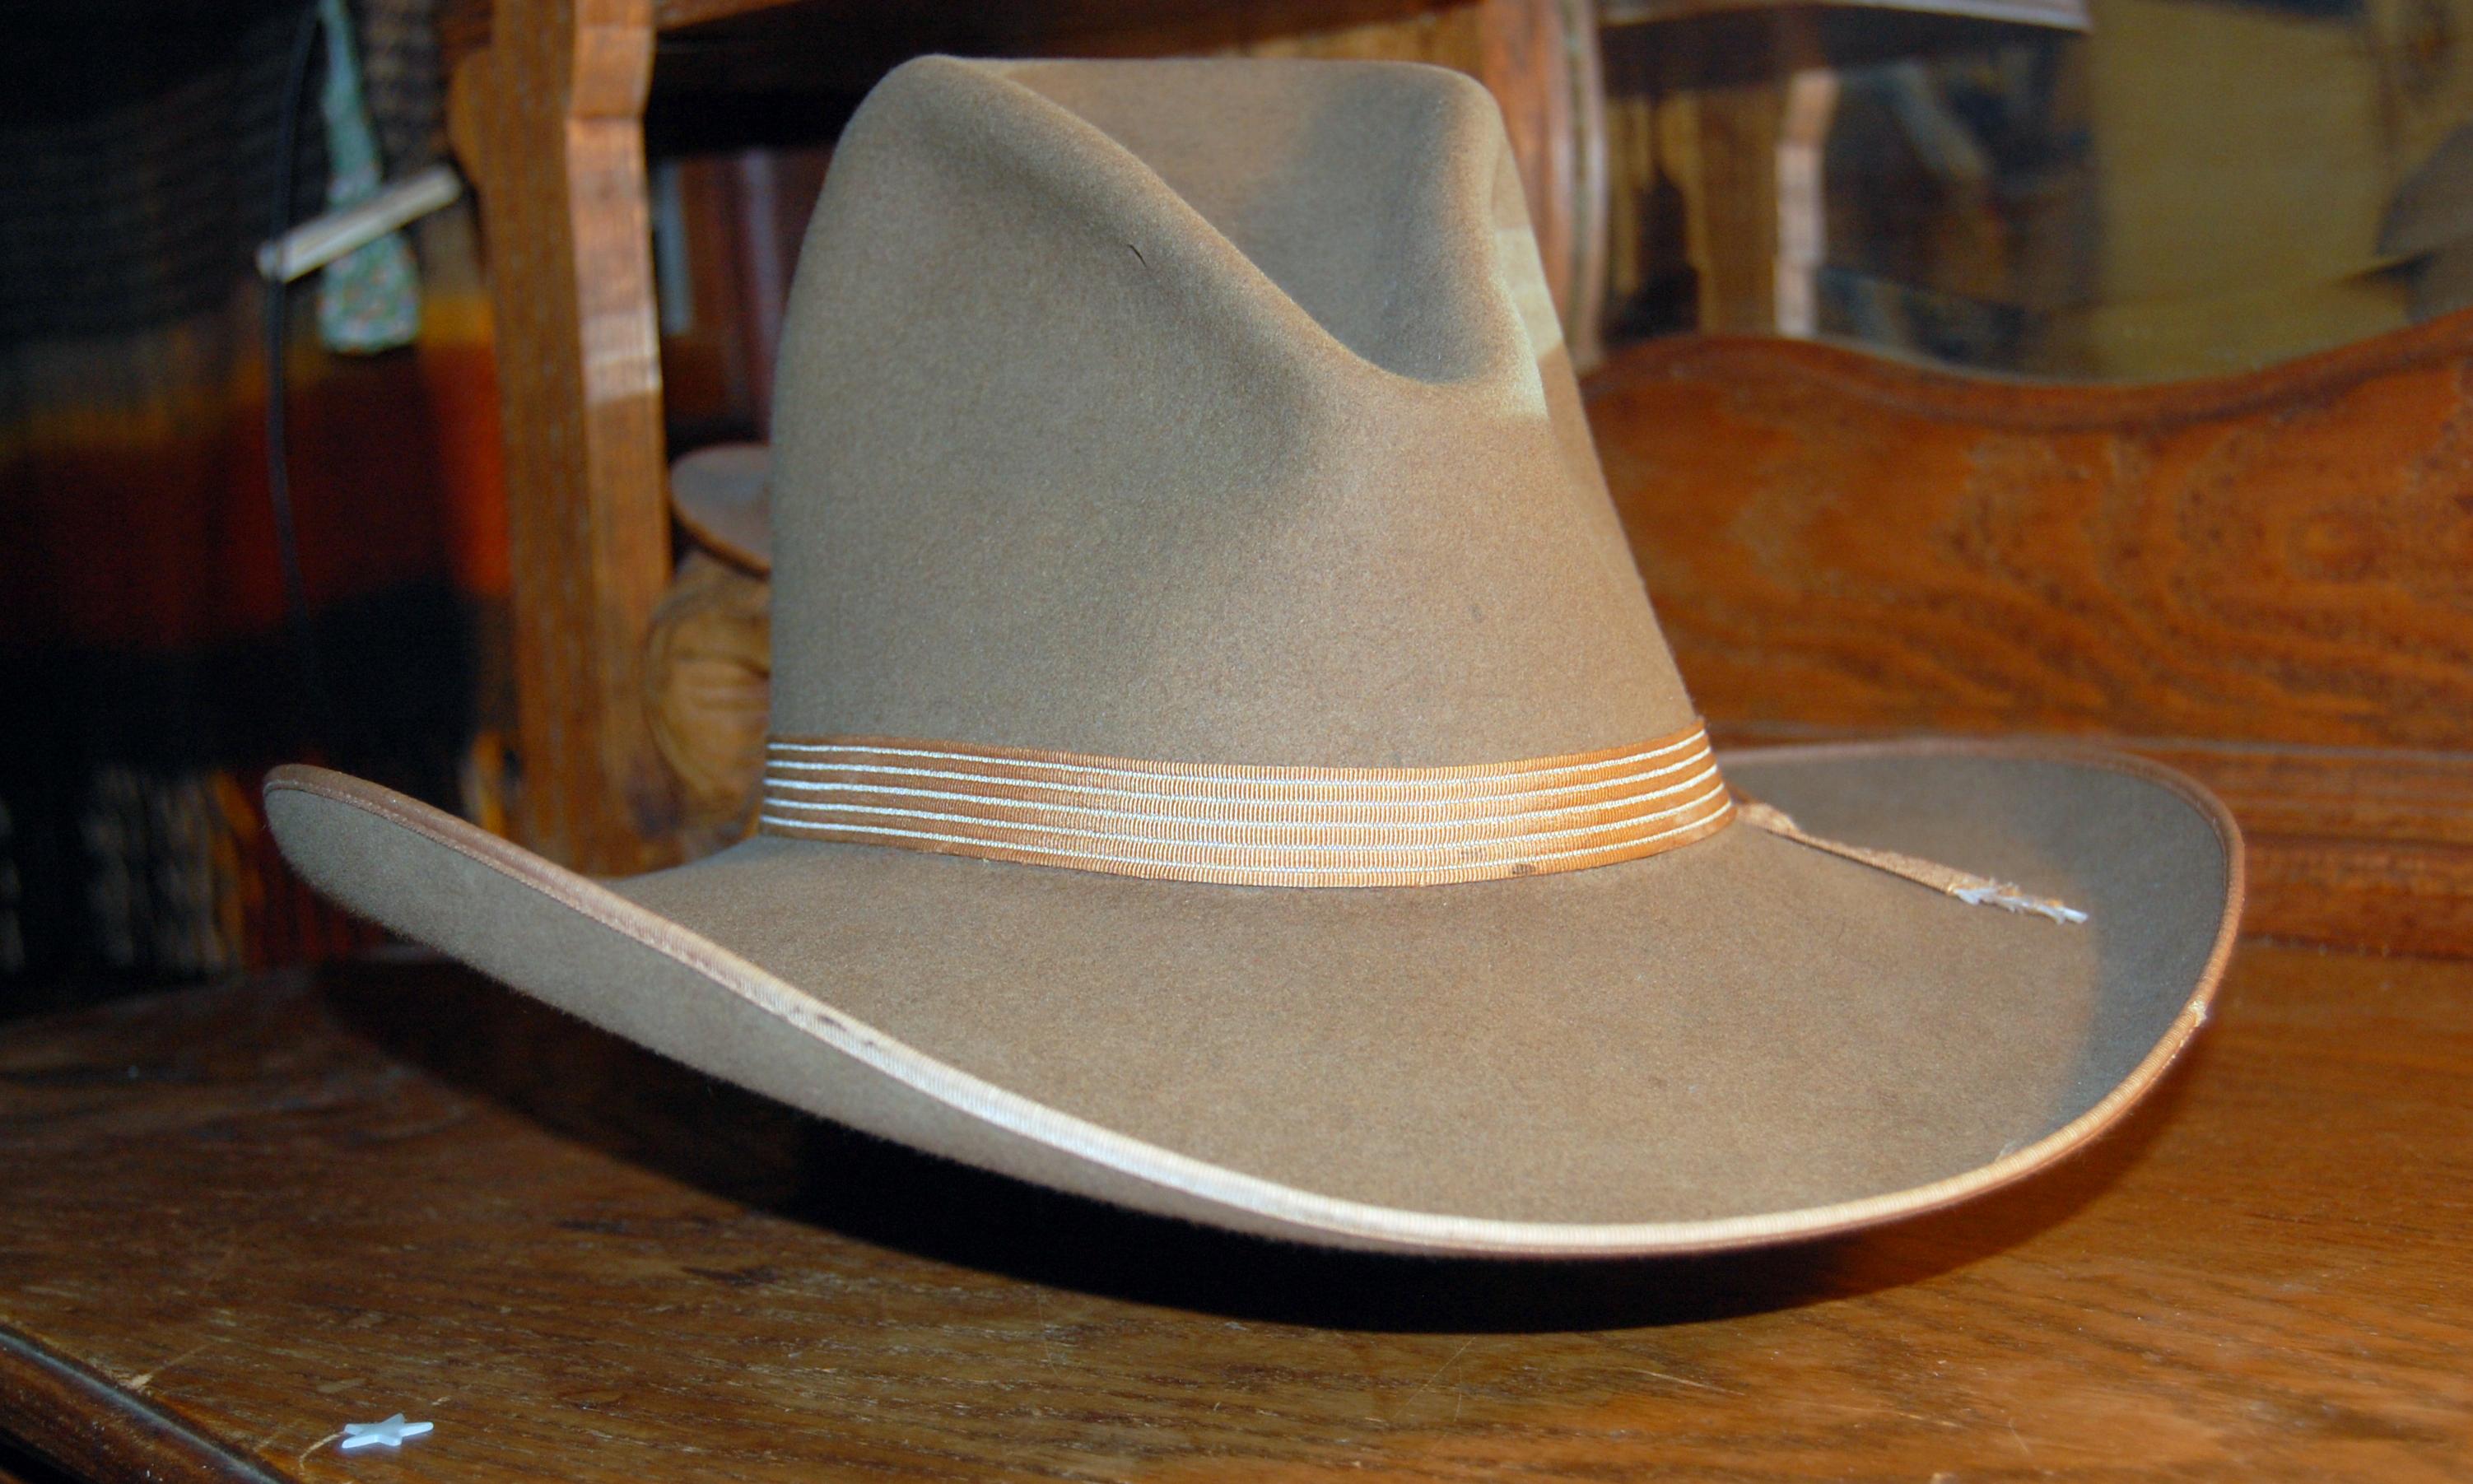 File Stetson cowboy hat 1950 5.JPG - Wikimedia Commons 46938f4a4d44